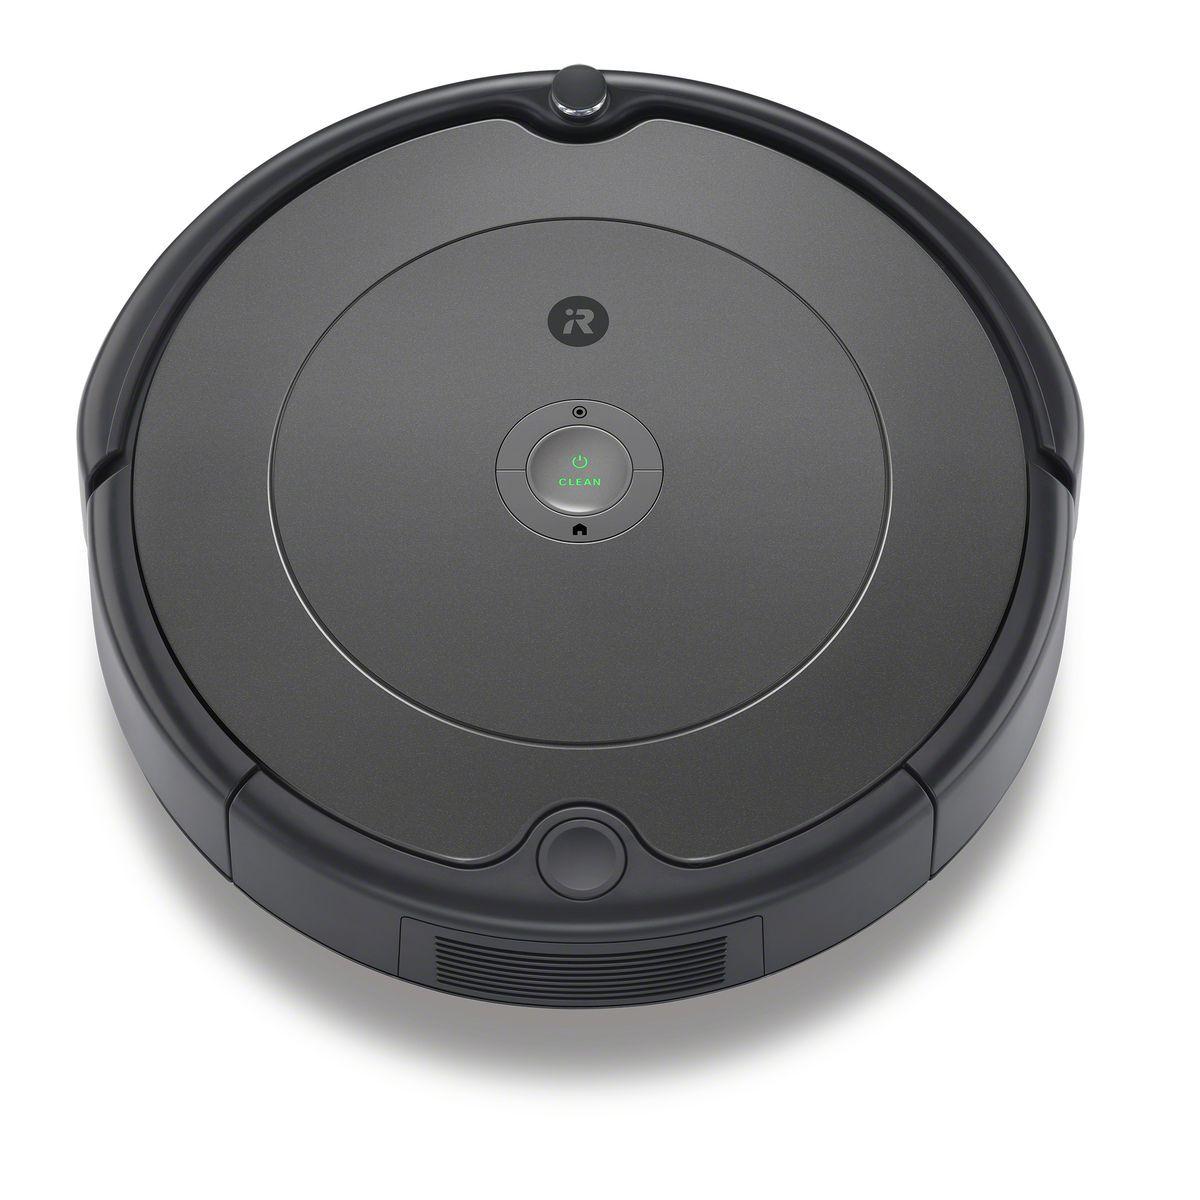 Aspirateur robot R697040 - Noir